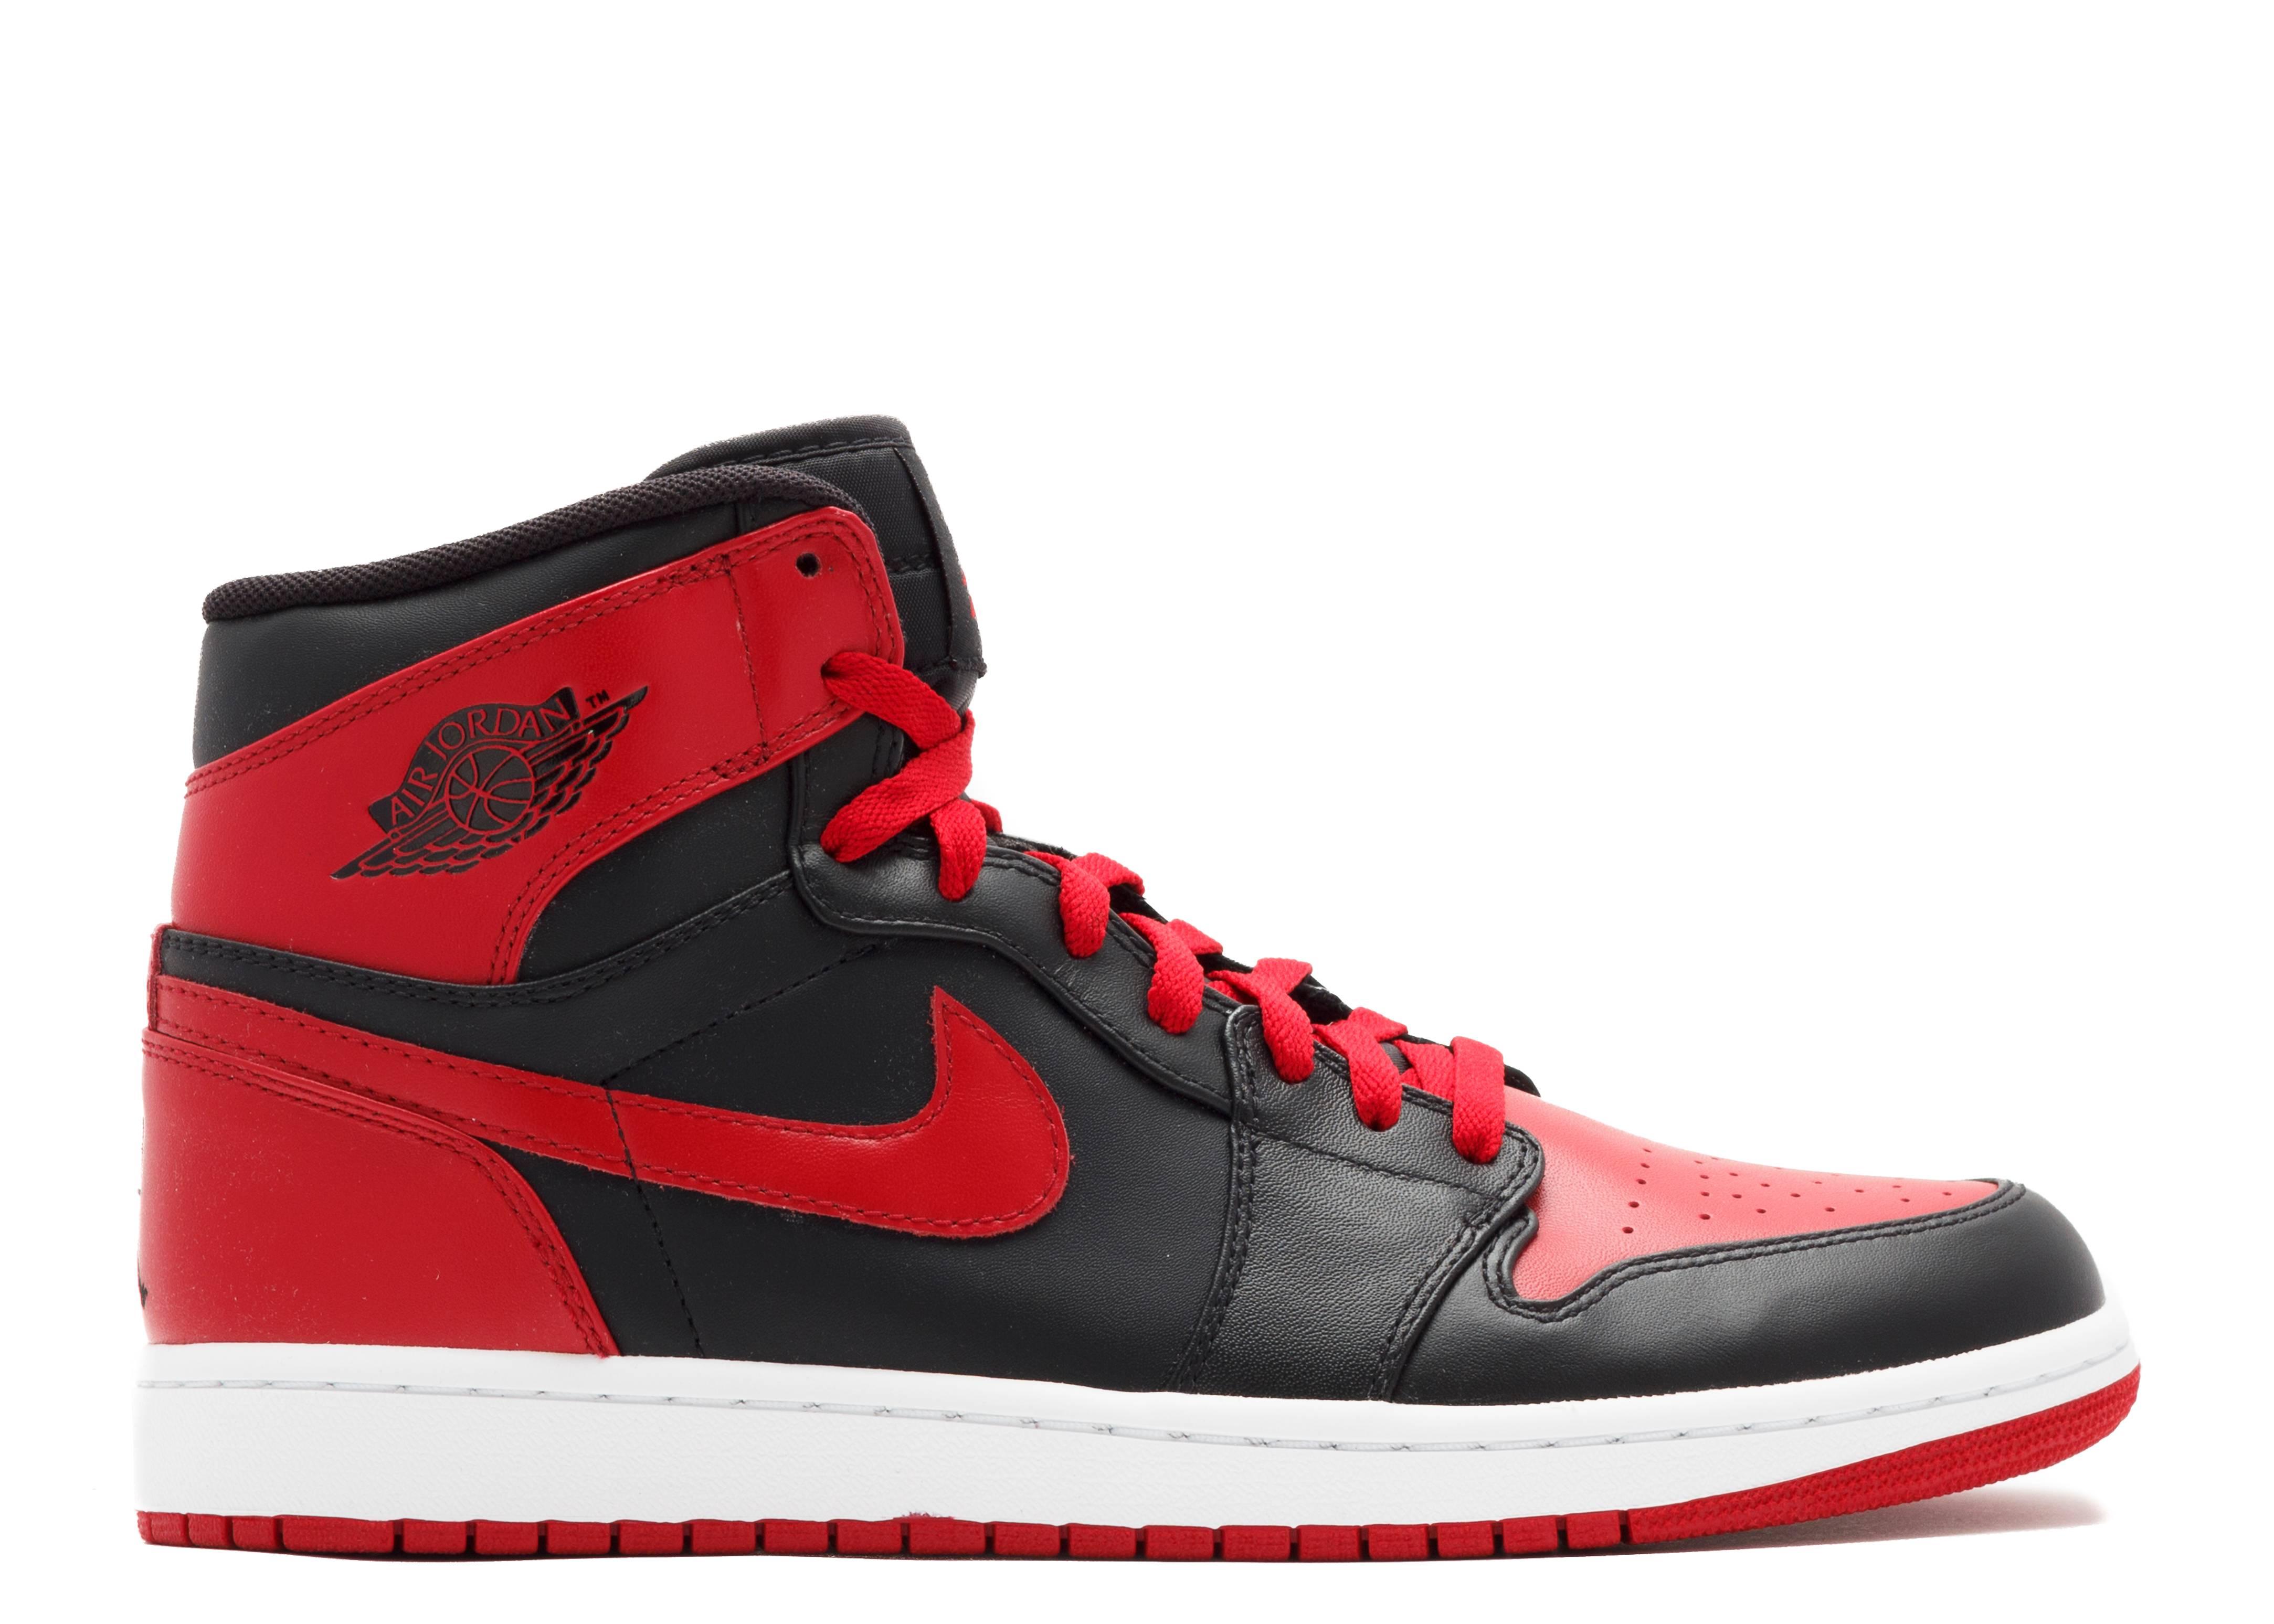 official photos 6f20d e5c8b Air Jordan 1 High Retro